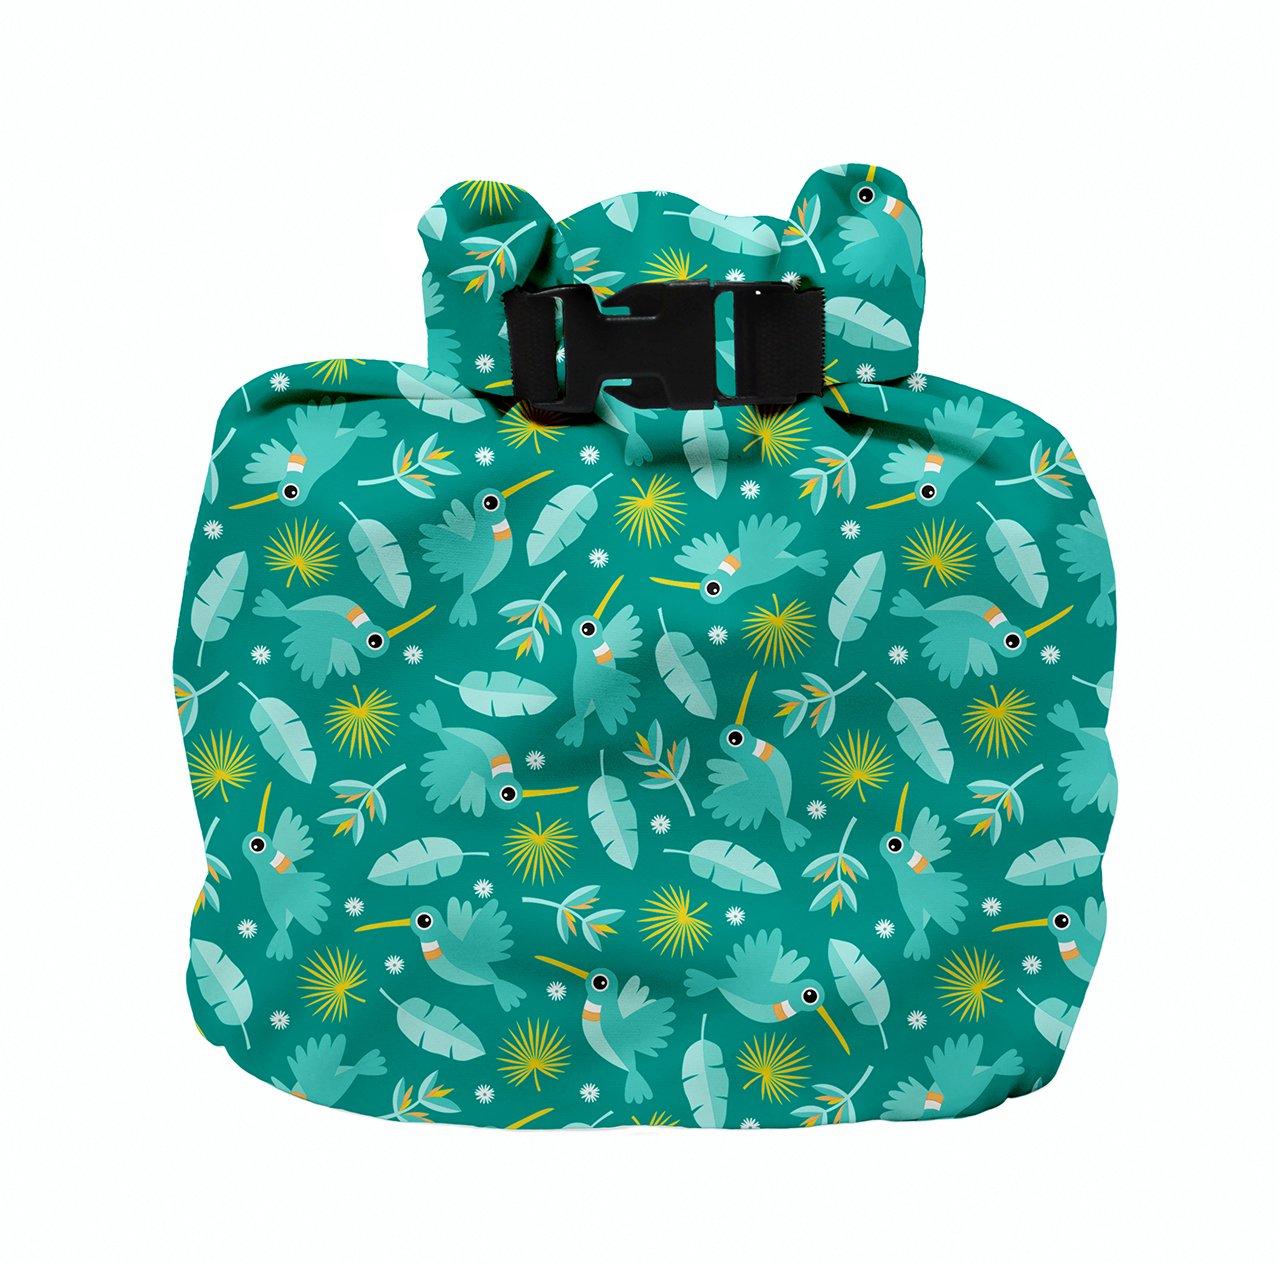 Bambino Mio Wet Diaper Bag, Hummingbird by Bambino Mio